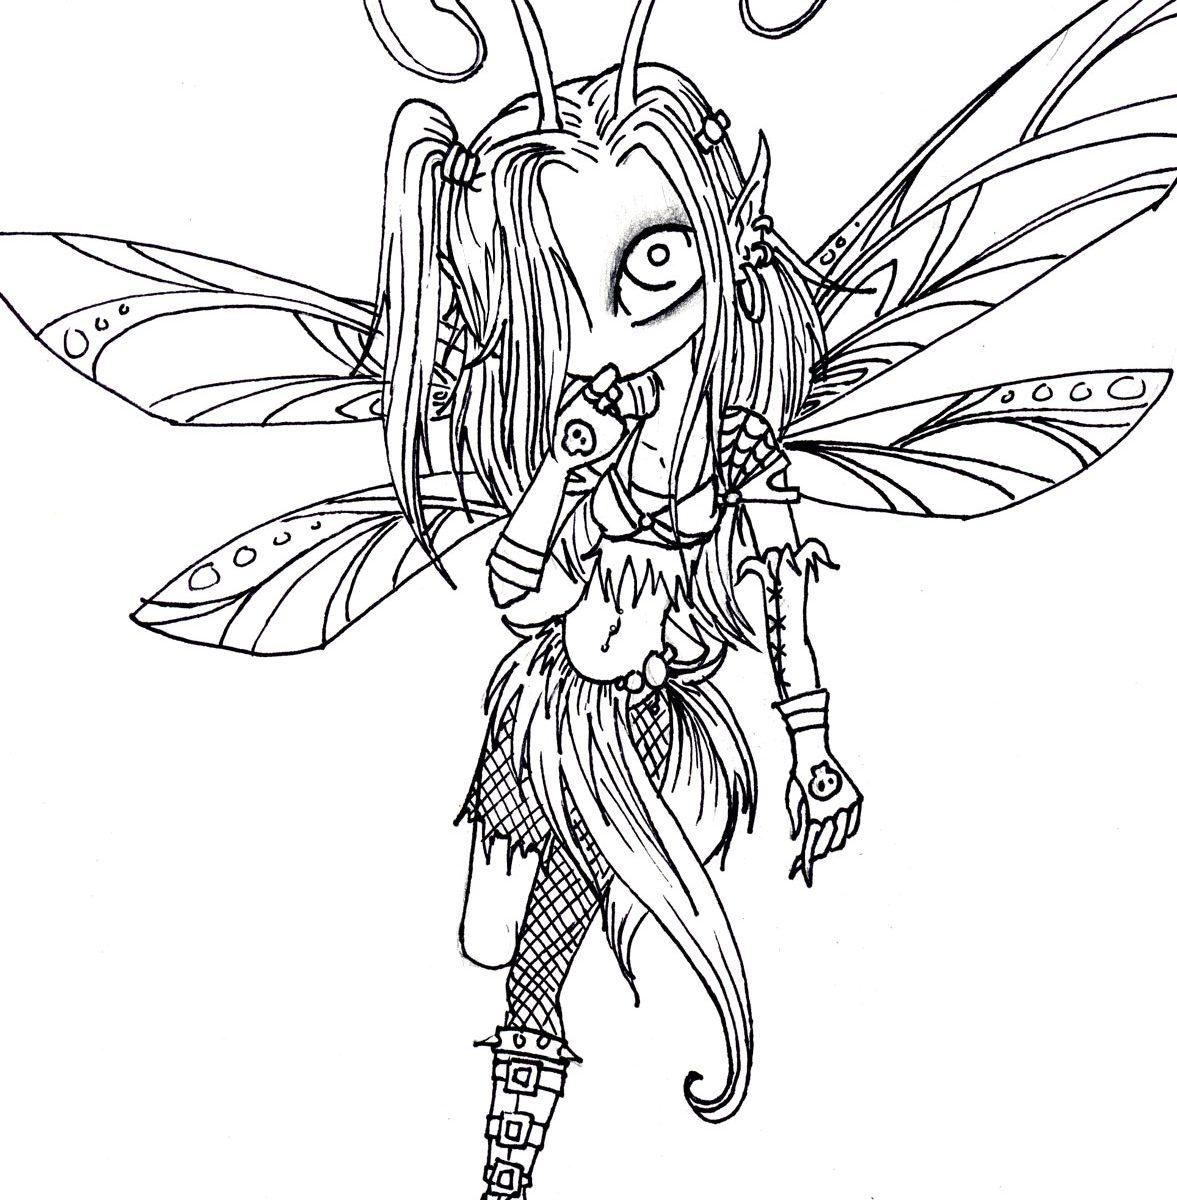 Dark Fairies Drawing at GetDrawings.com | Free for personal use Dark ...